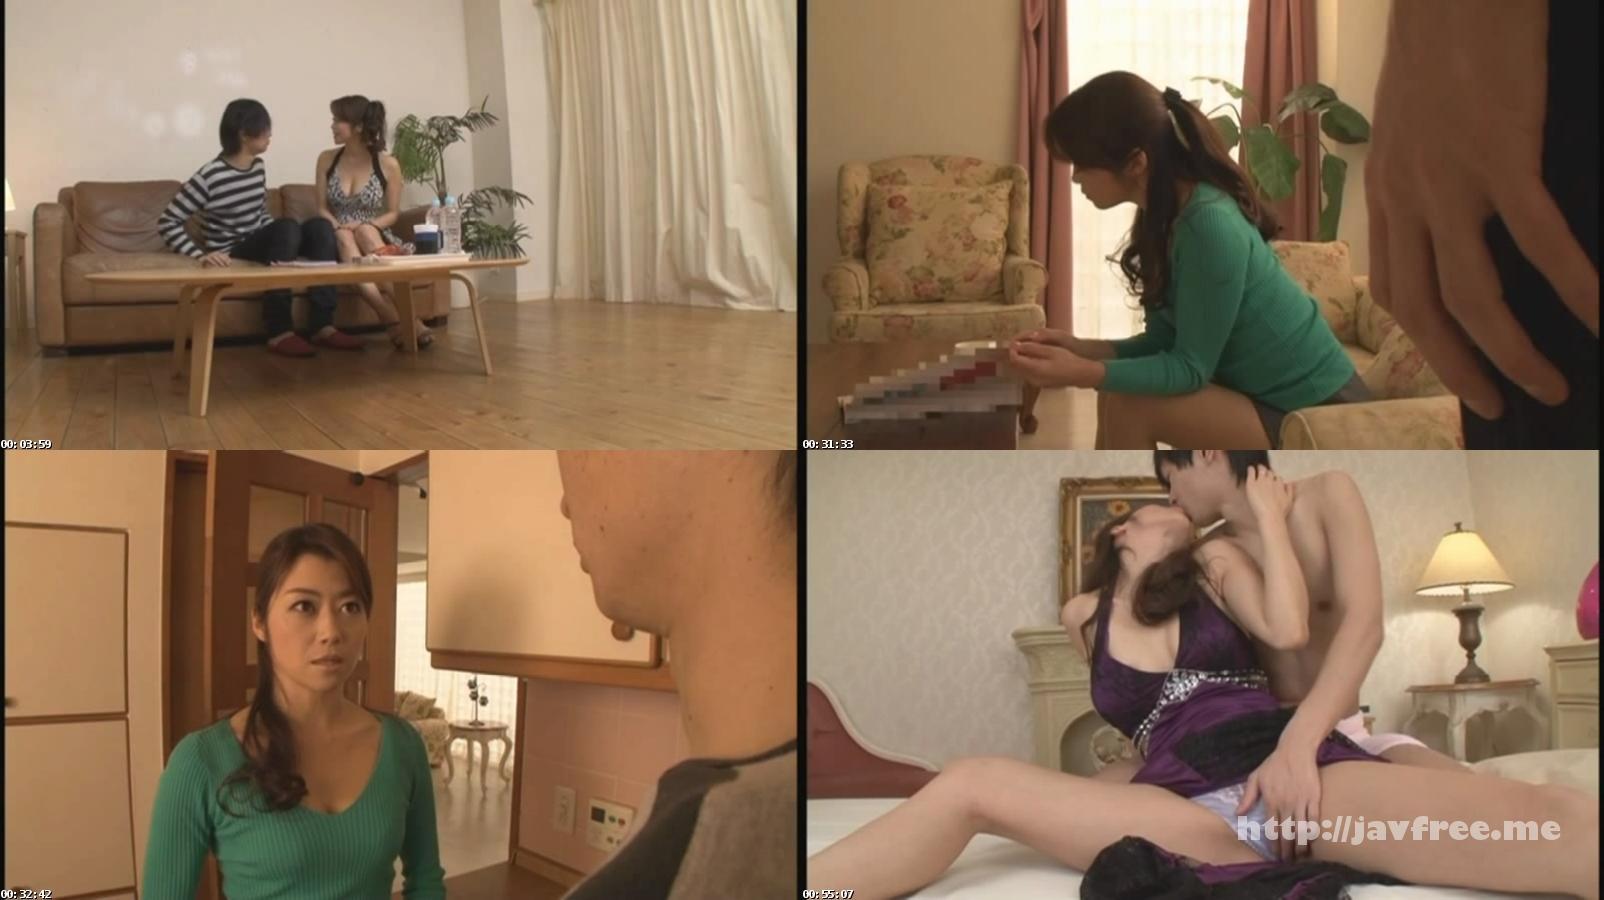 [VAGU-087] 近親相姦中出しソープ 初めての熟女風俗、指名したら母ちゃんだった 北条麻妃 - image VAGU-087 on https://javfree.me